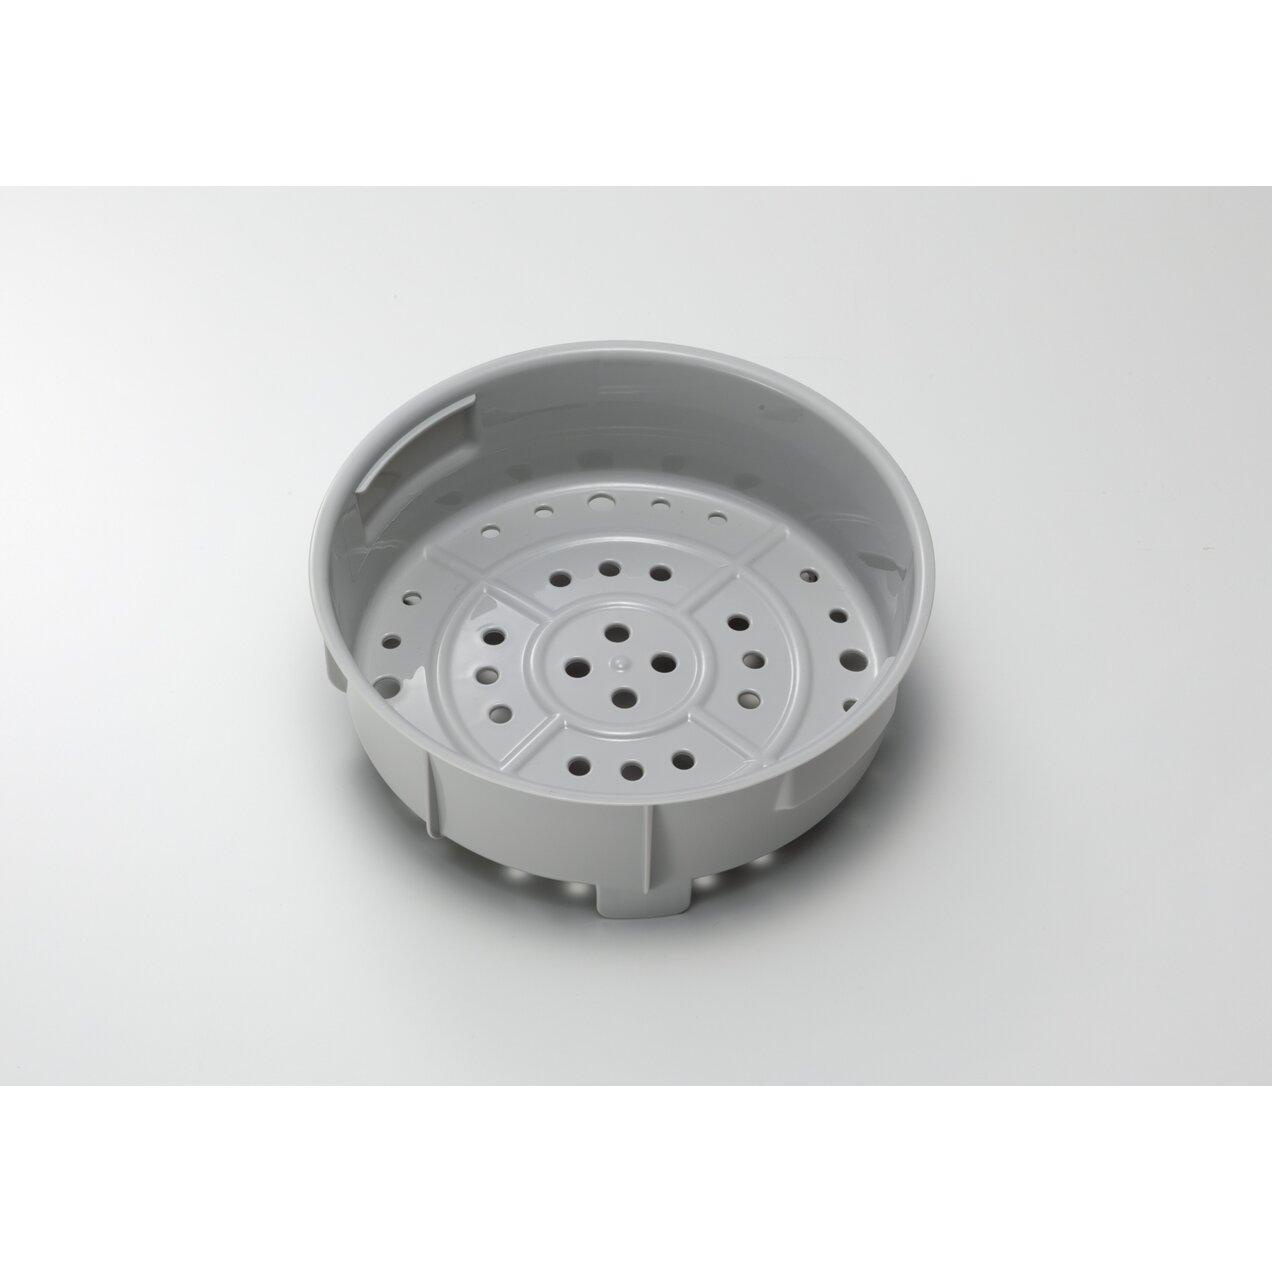 Micom Rice Cooker & Warmer